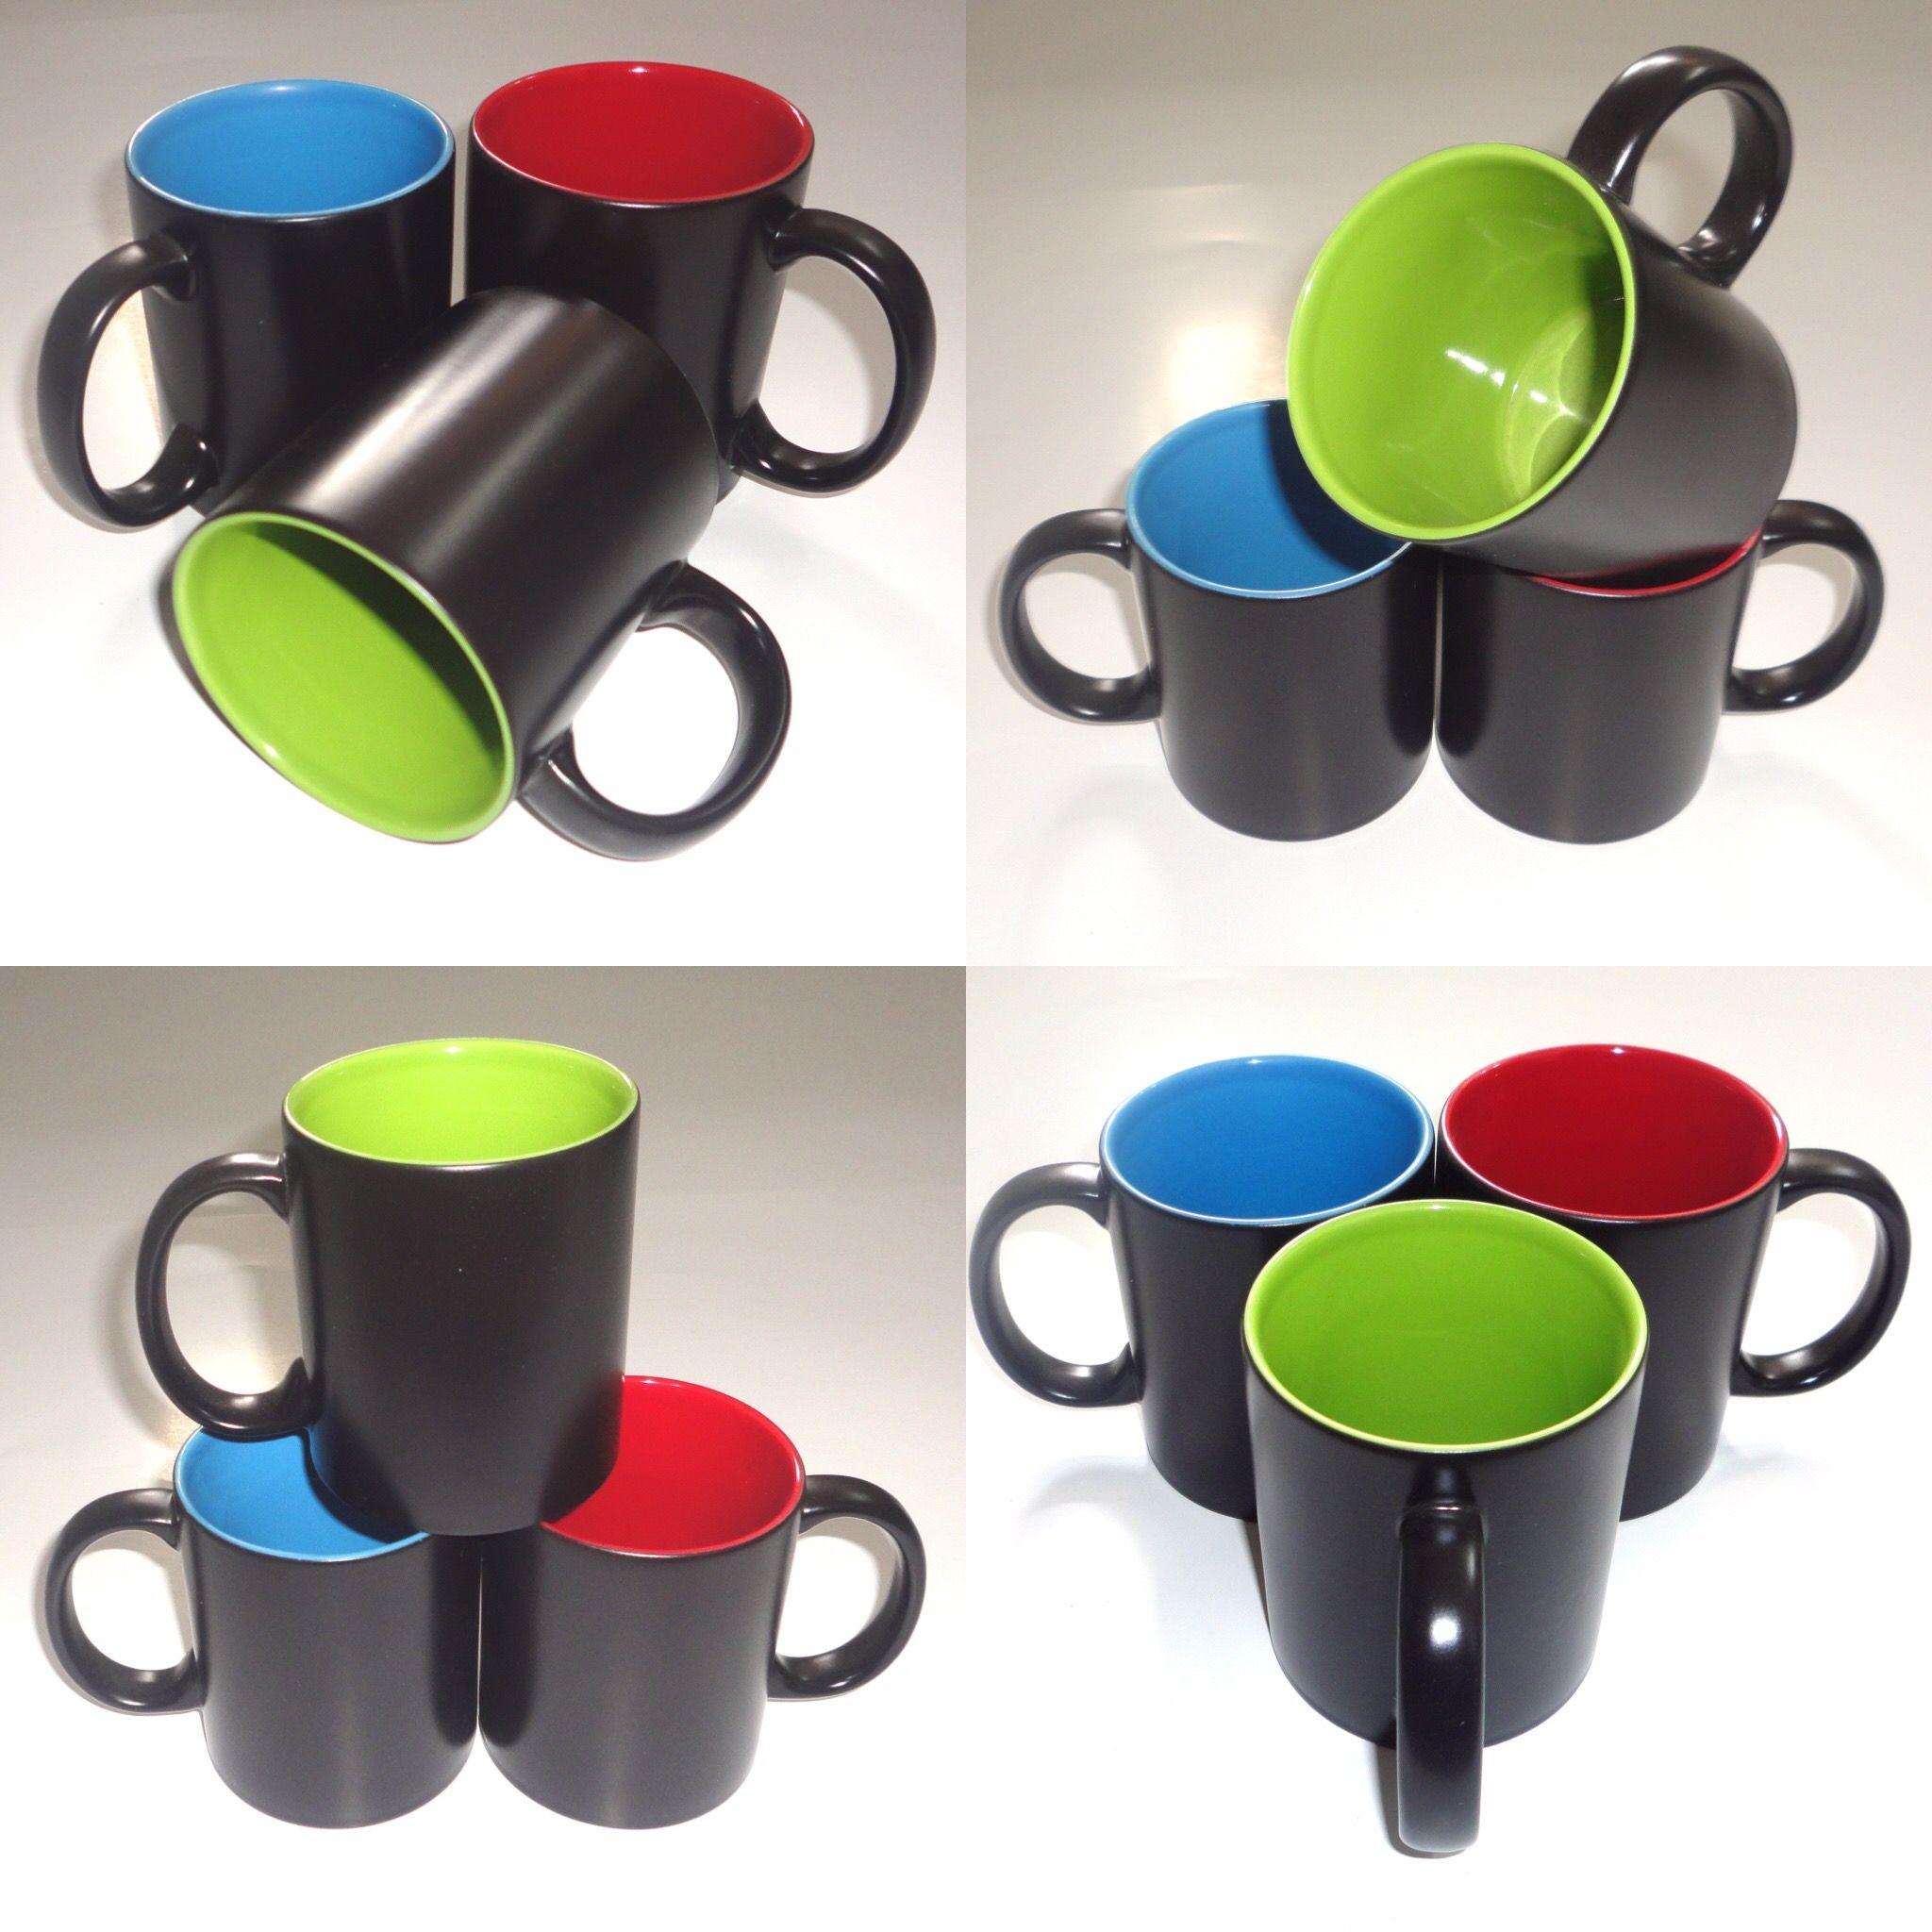 97dbaea84d8 11oz inner color outside black magic mug | sublimation mugs and ...